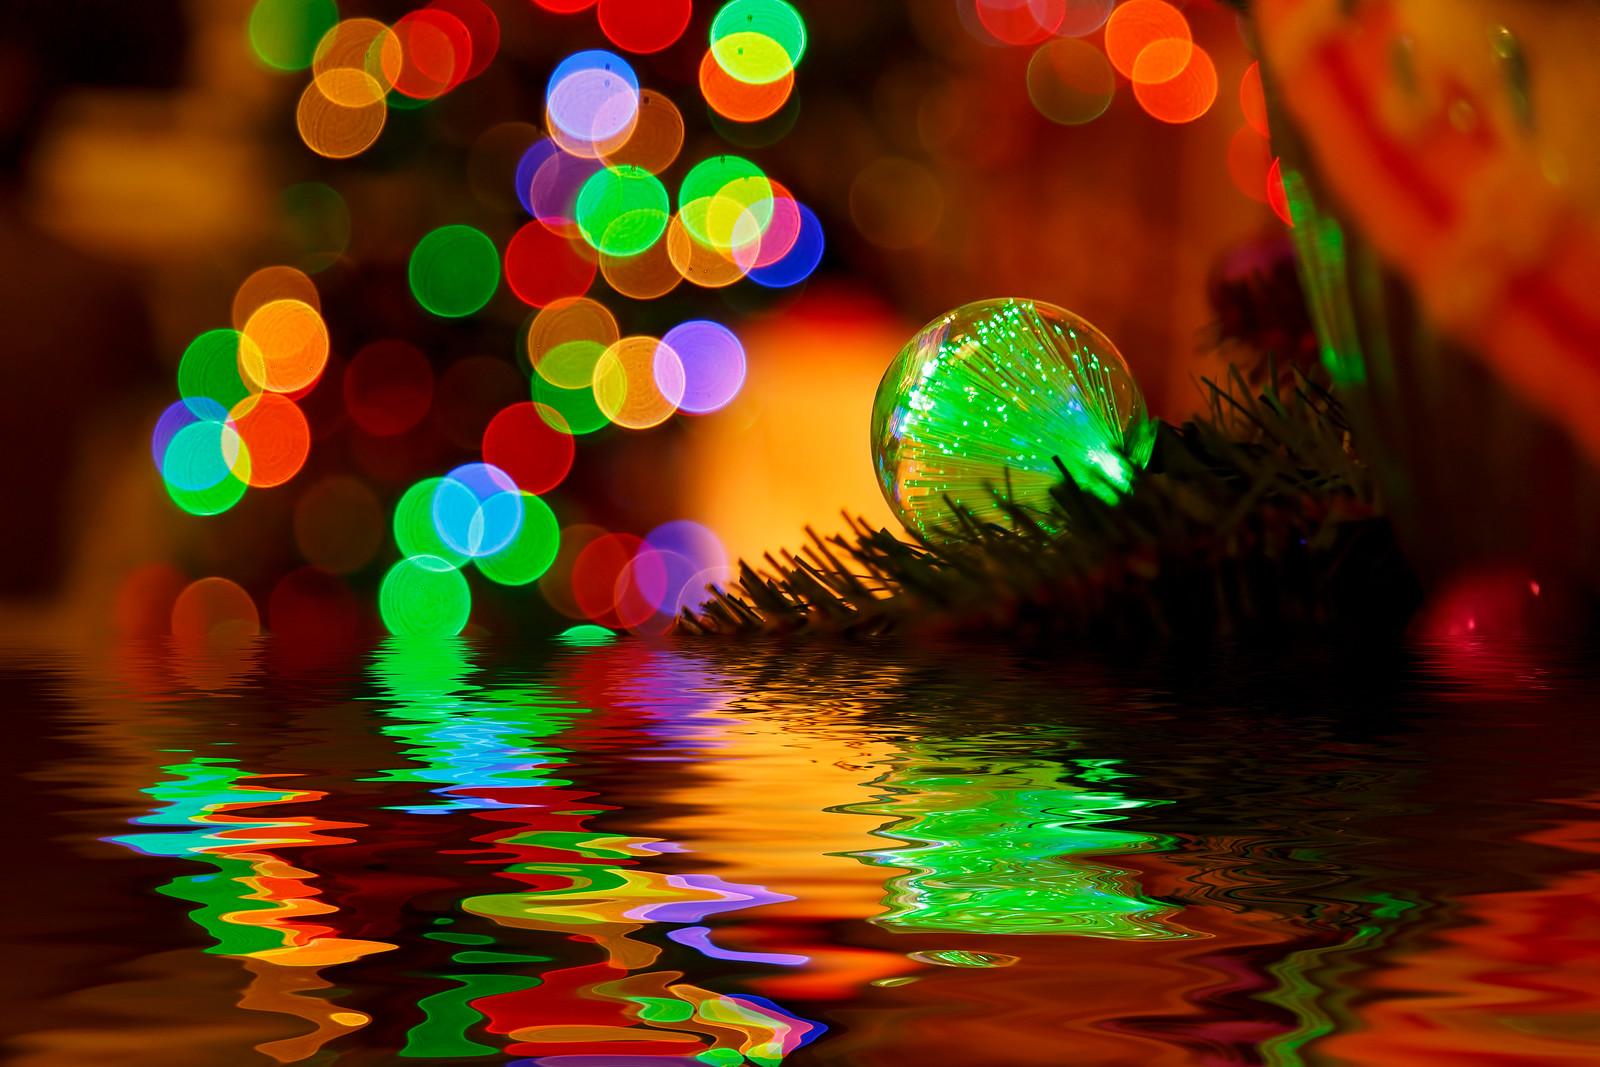 A Flood of Christmas